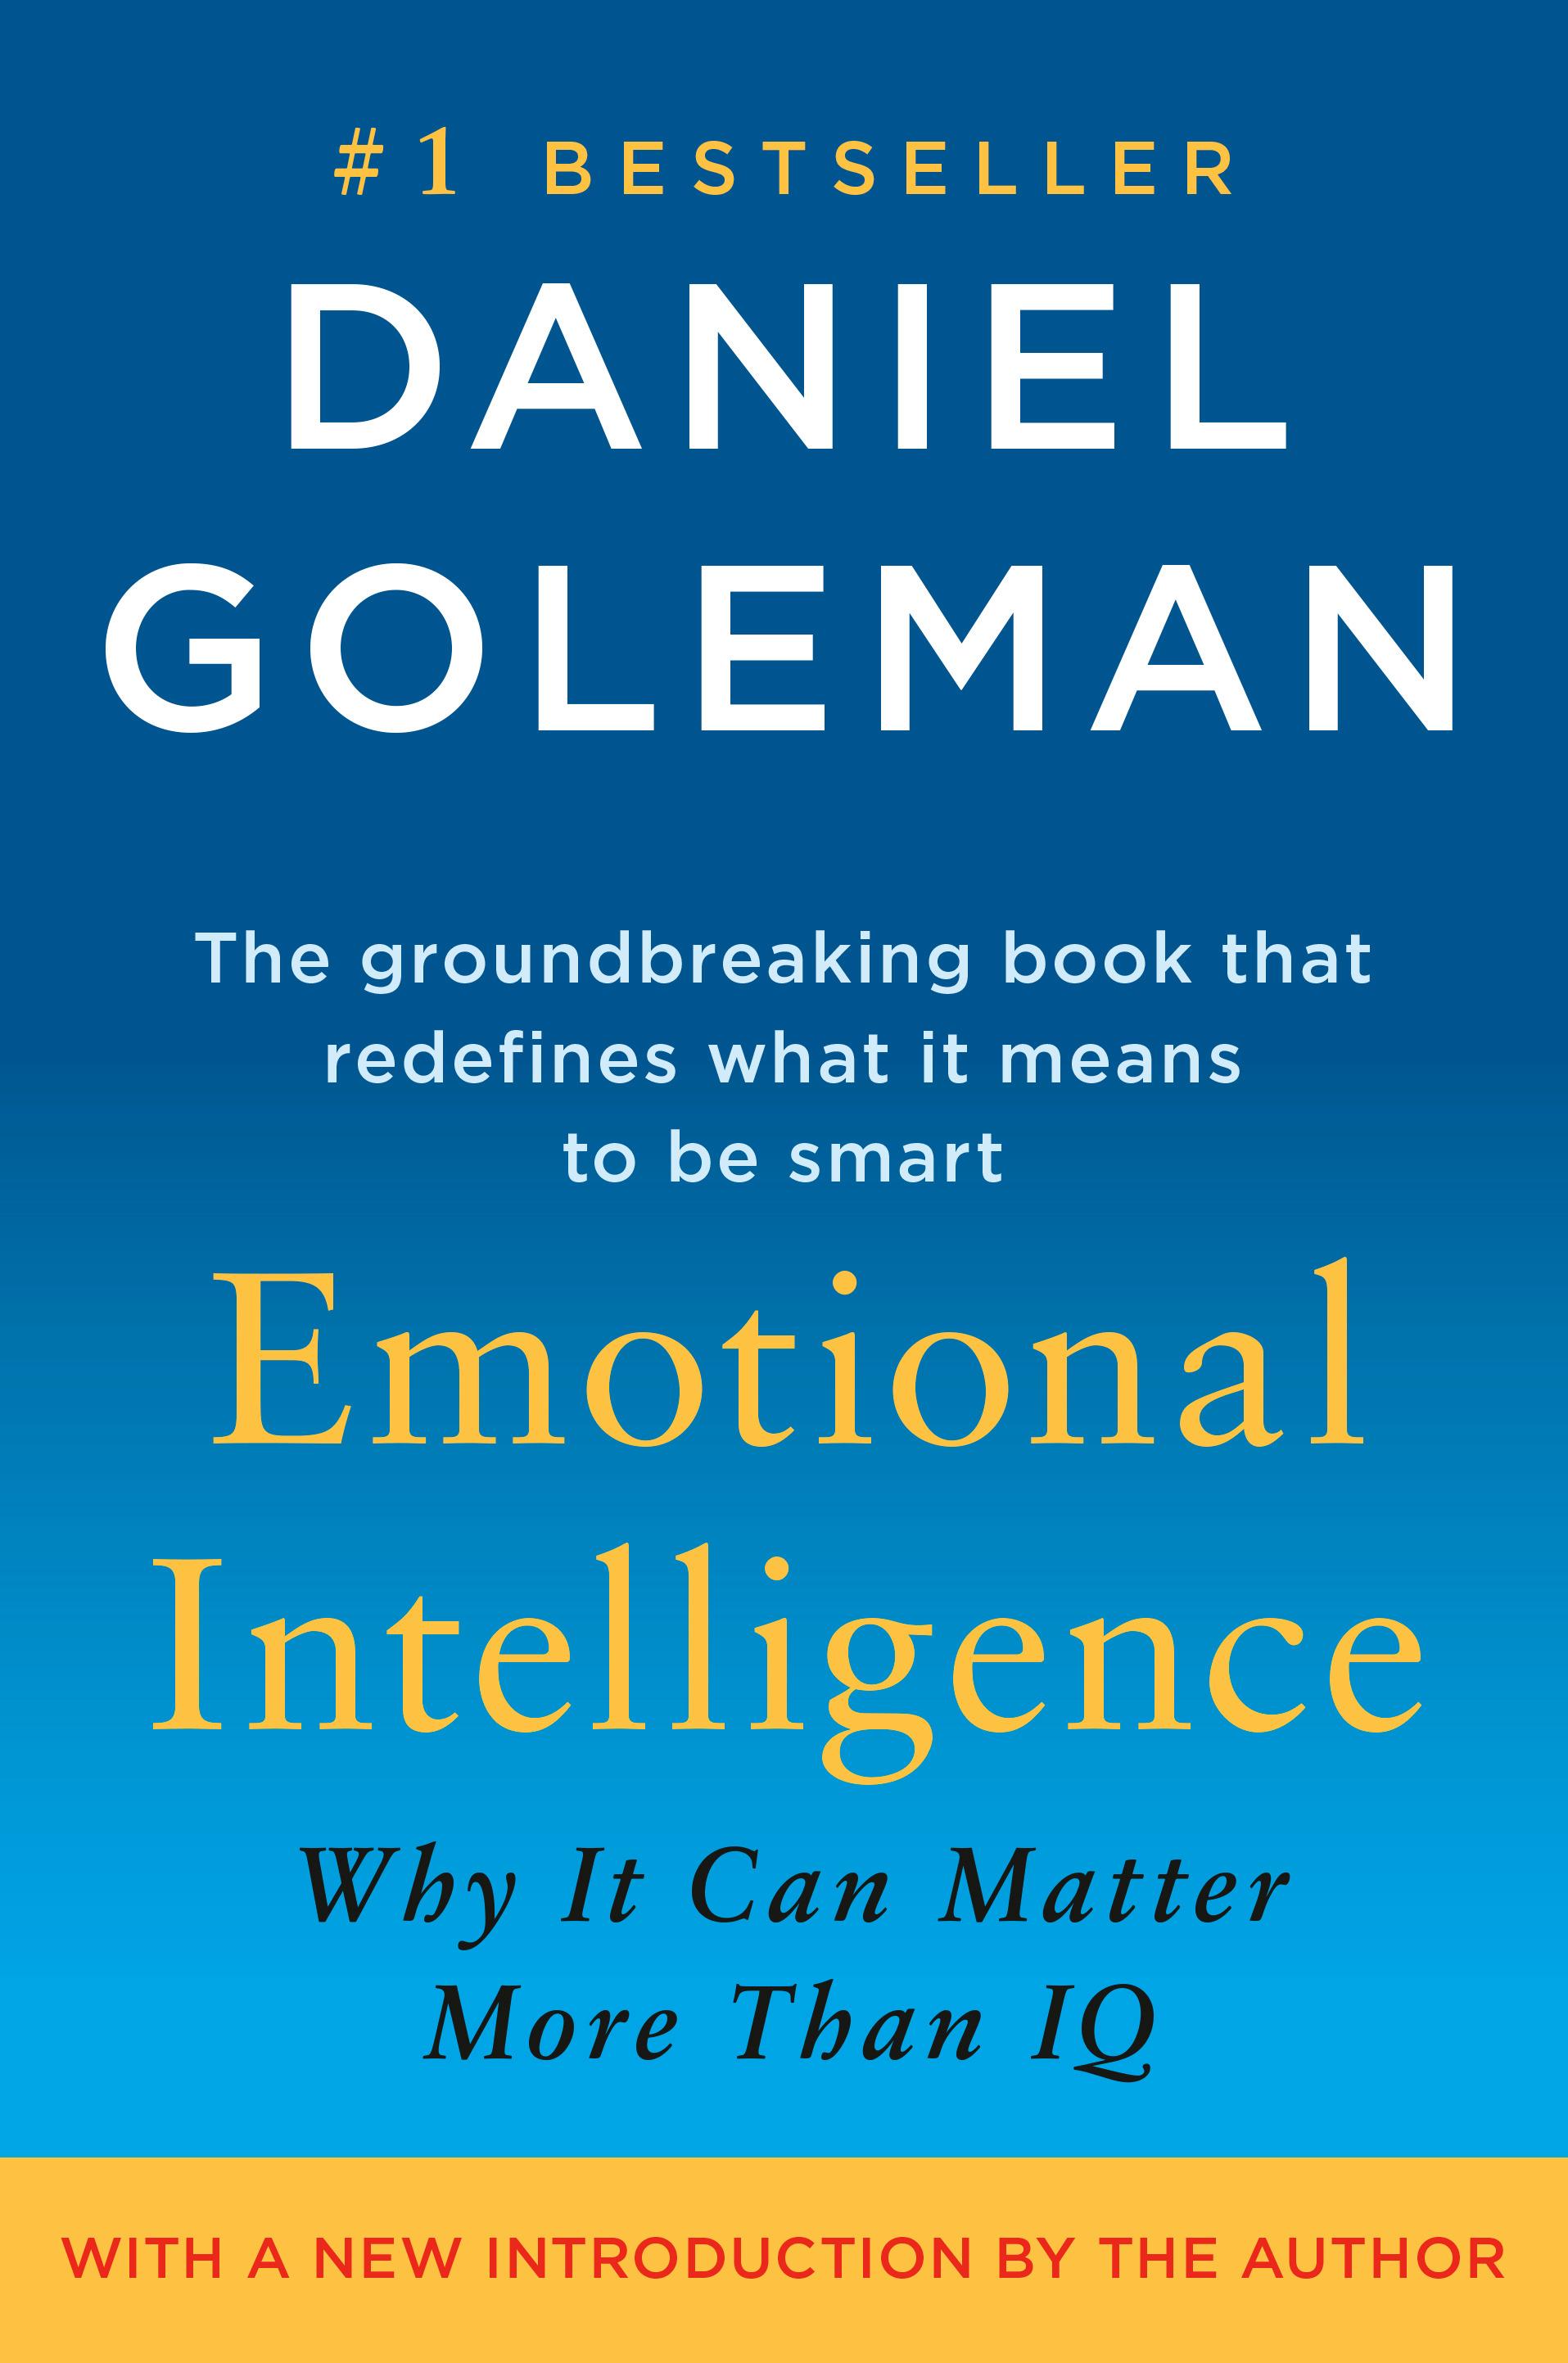 Download Ebook Emotional Intelligence by Daniel Goleman Pdf